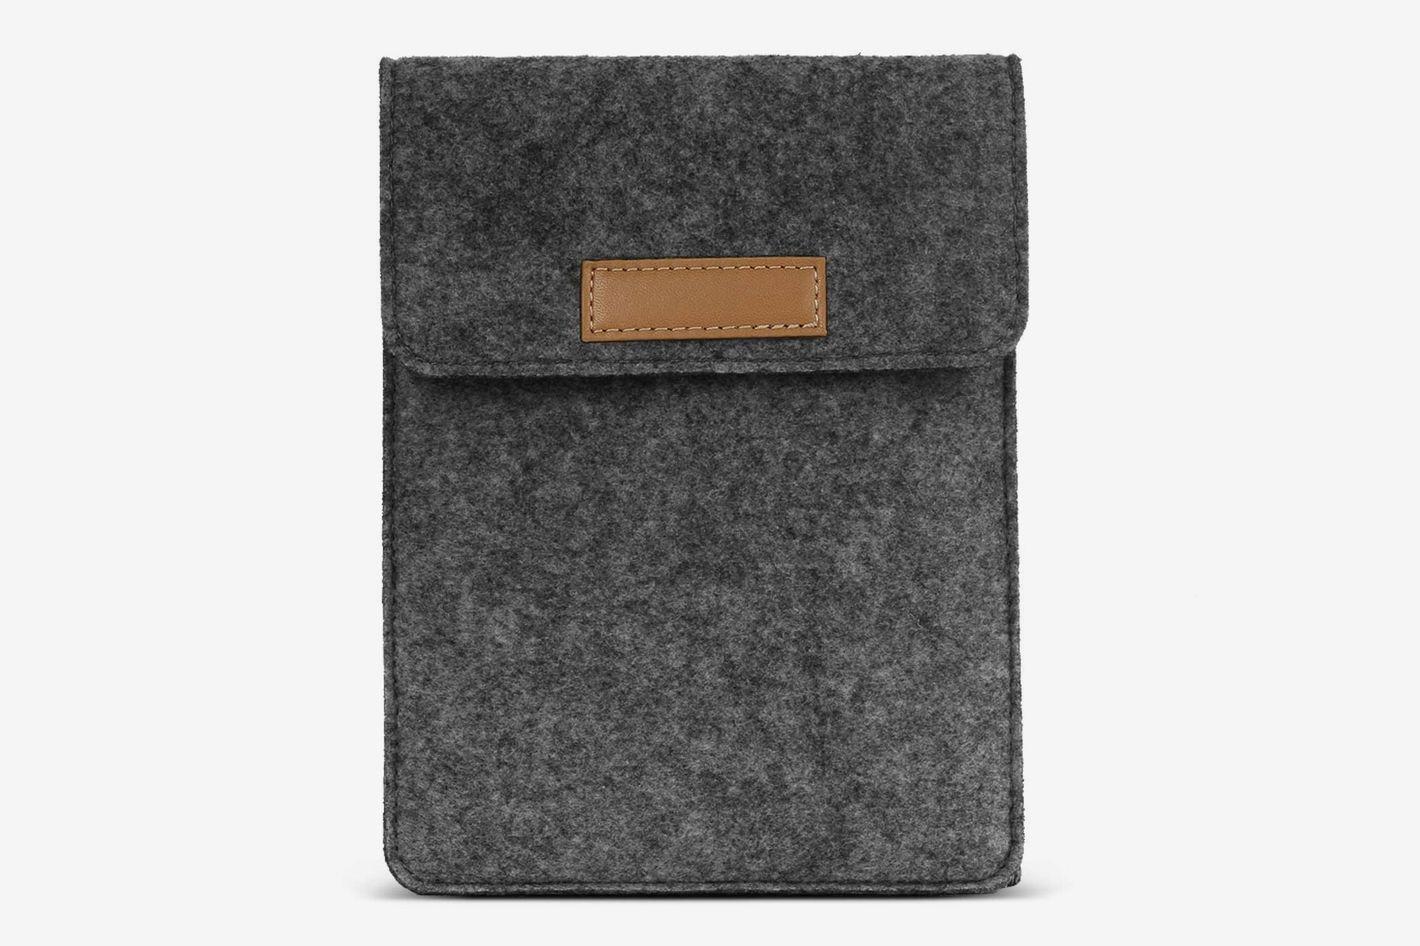 MoKo Sleeve for Kindle Paperwhite